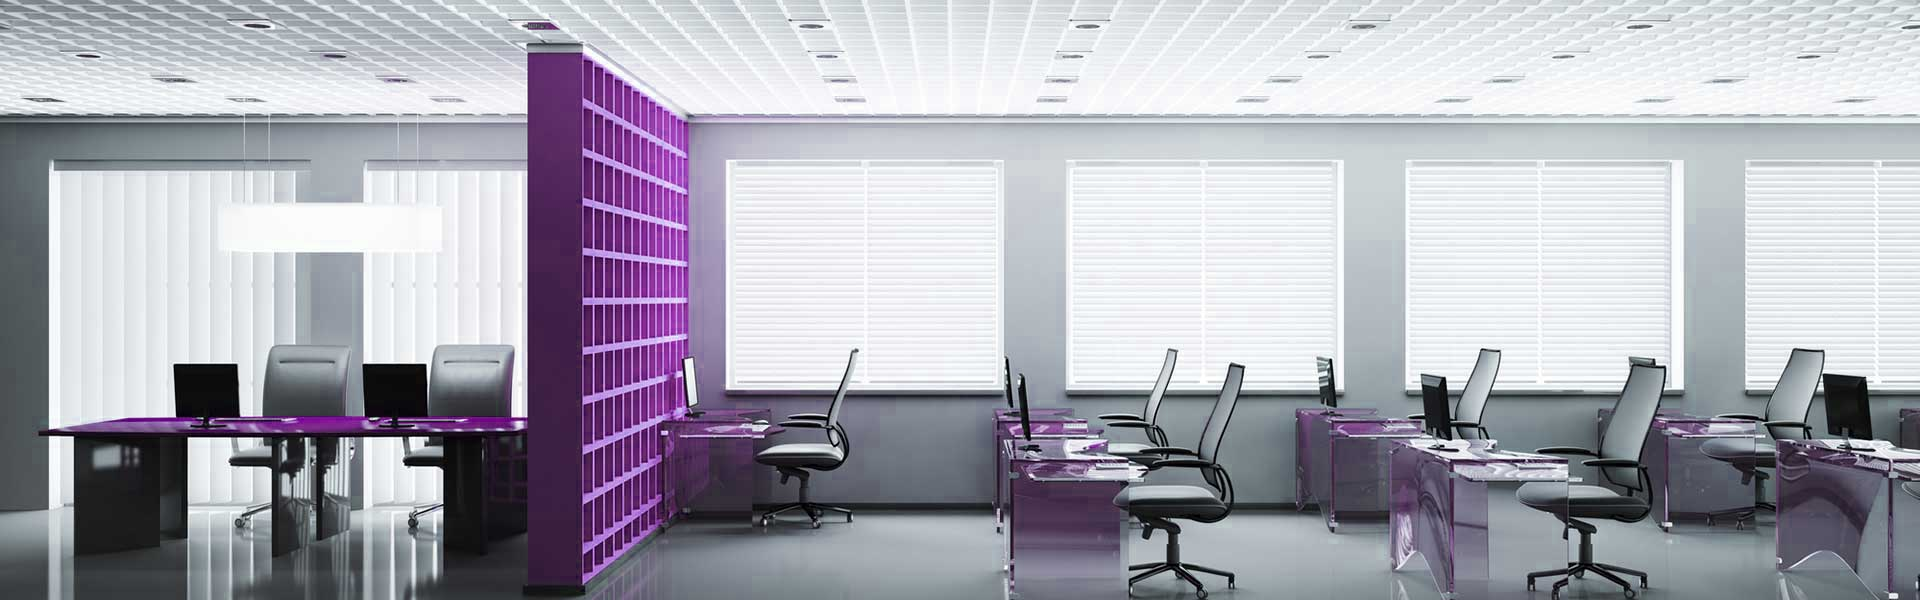 Office Furniture in Halifax